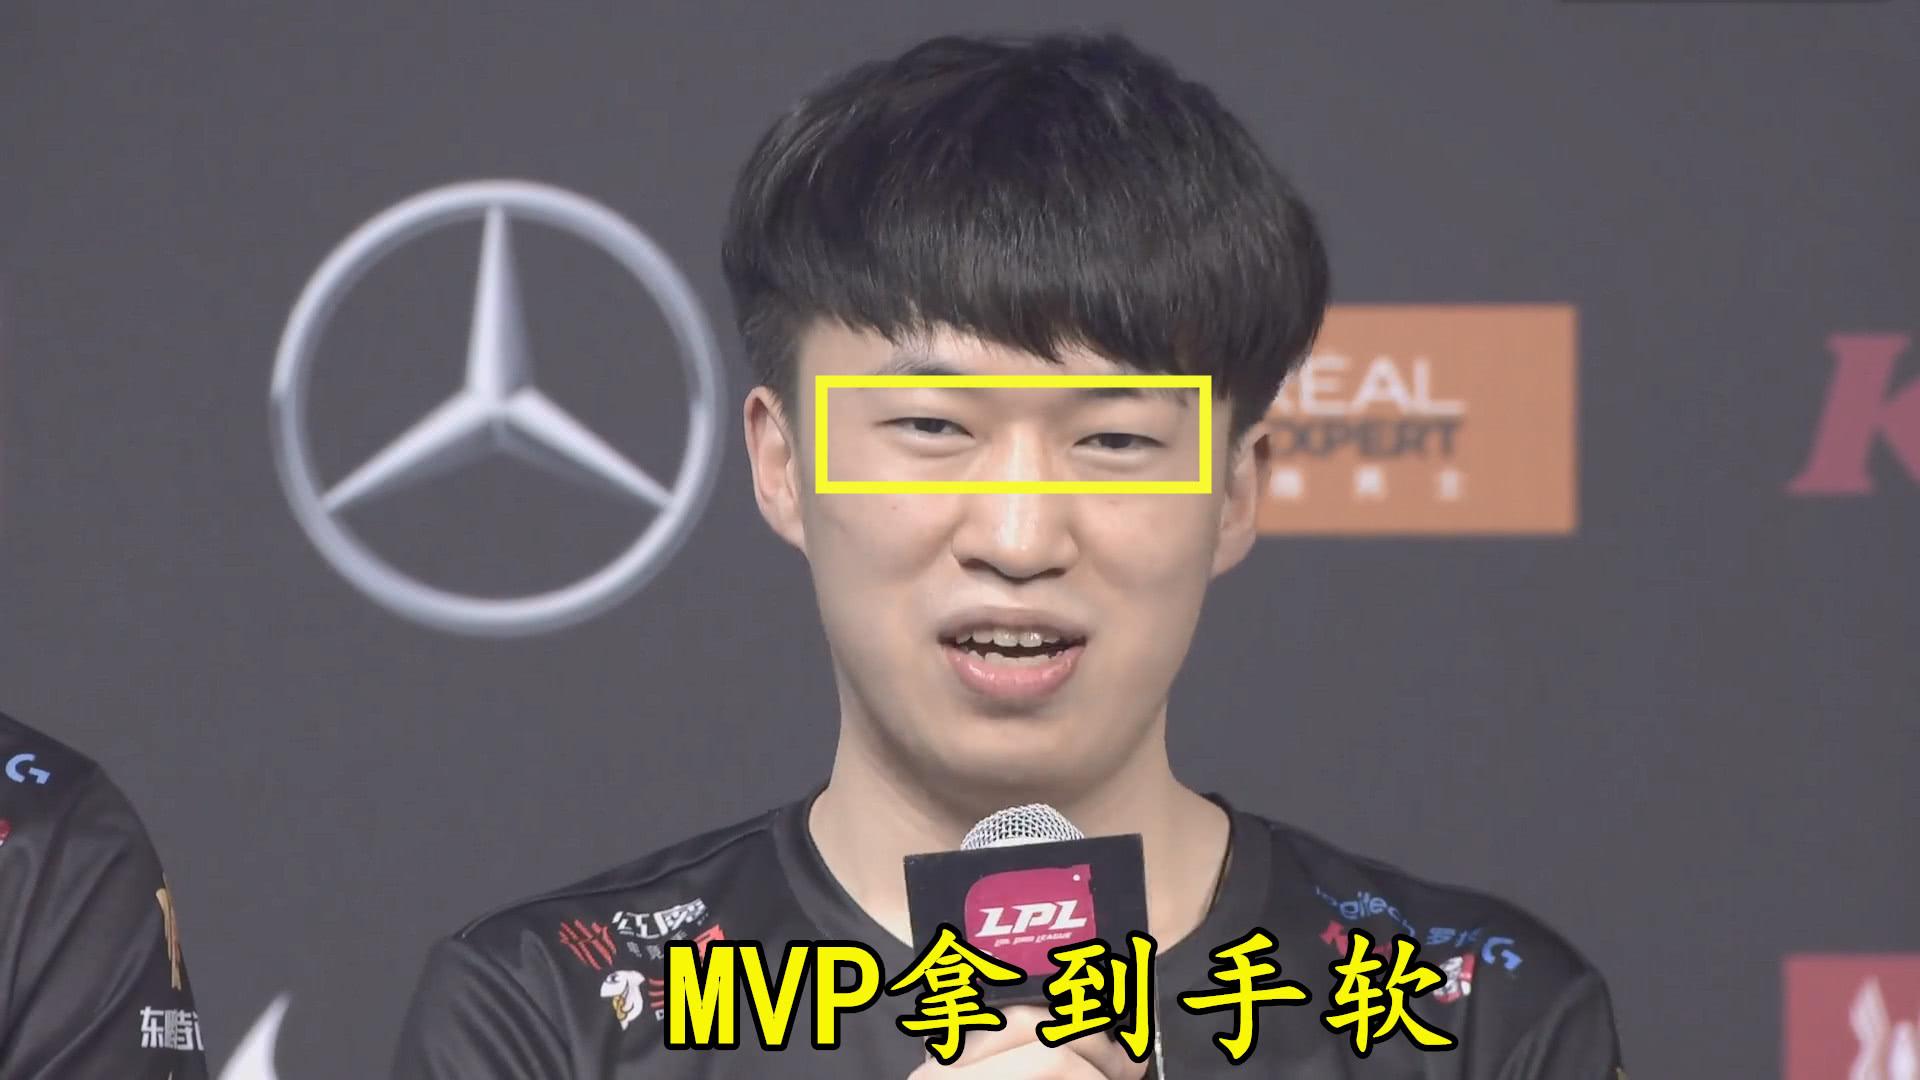 RNG拿下五个2-0,小虎送护目镜粉丝挨夸,MVP拿到手软!